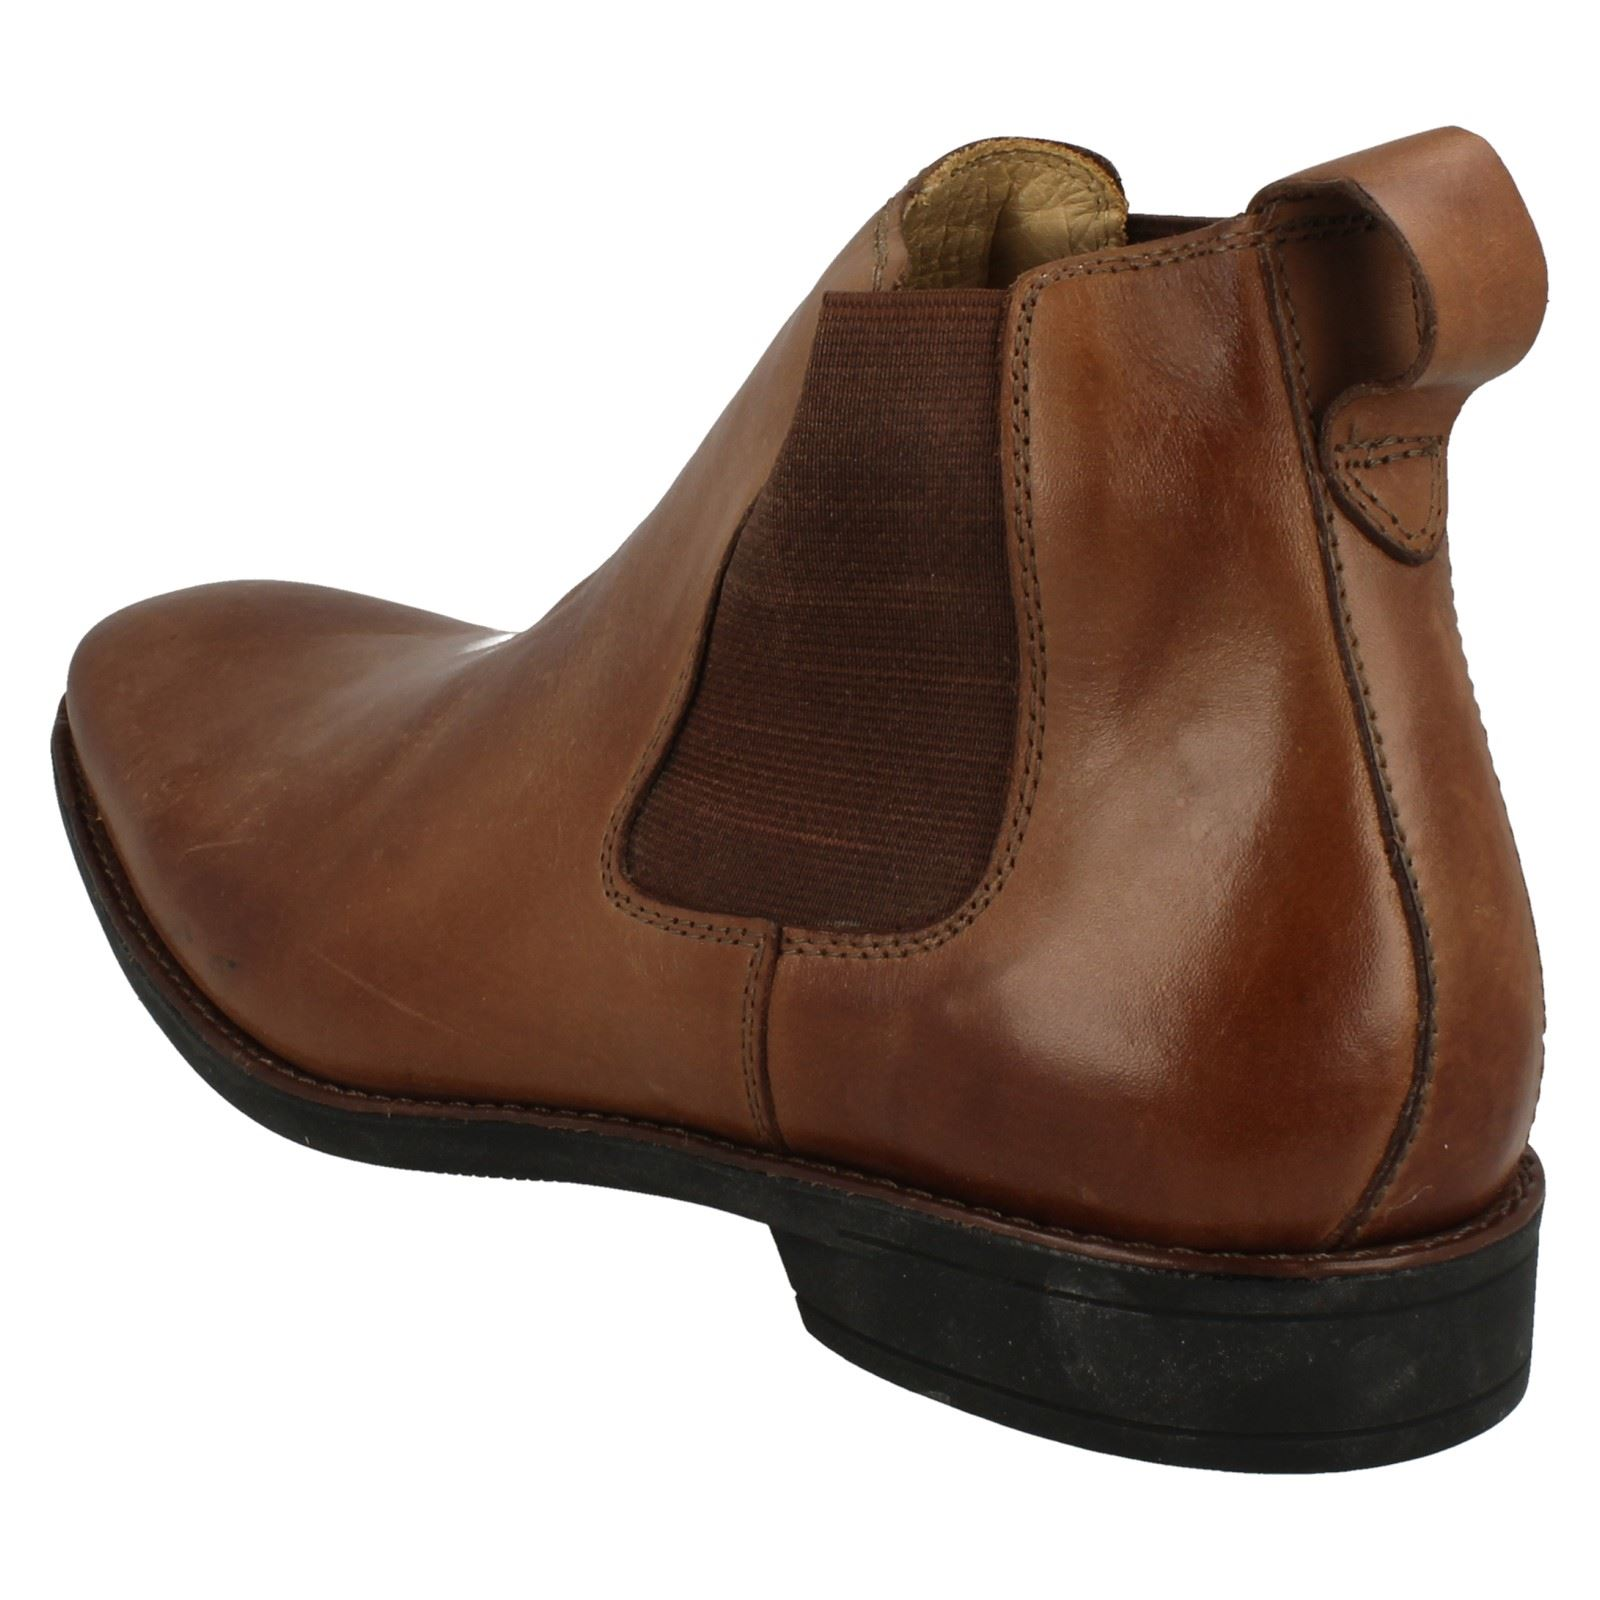 Mens-Anatomic-Chelsea-Boots-039-929211LB-039 thumbnail 13